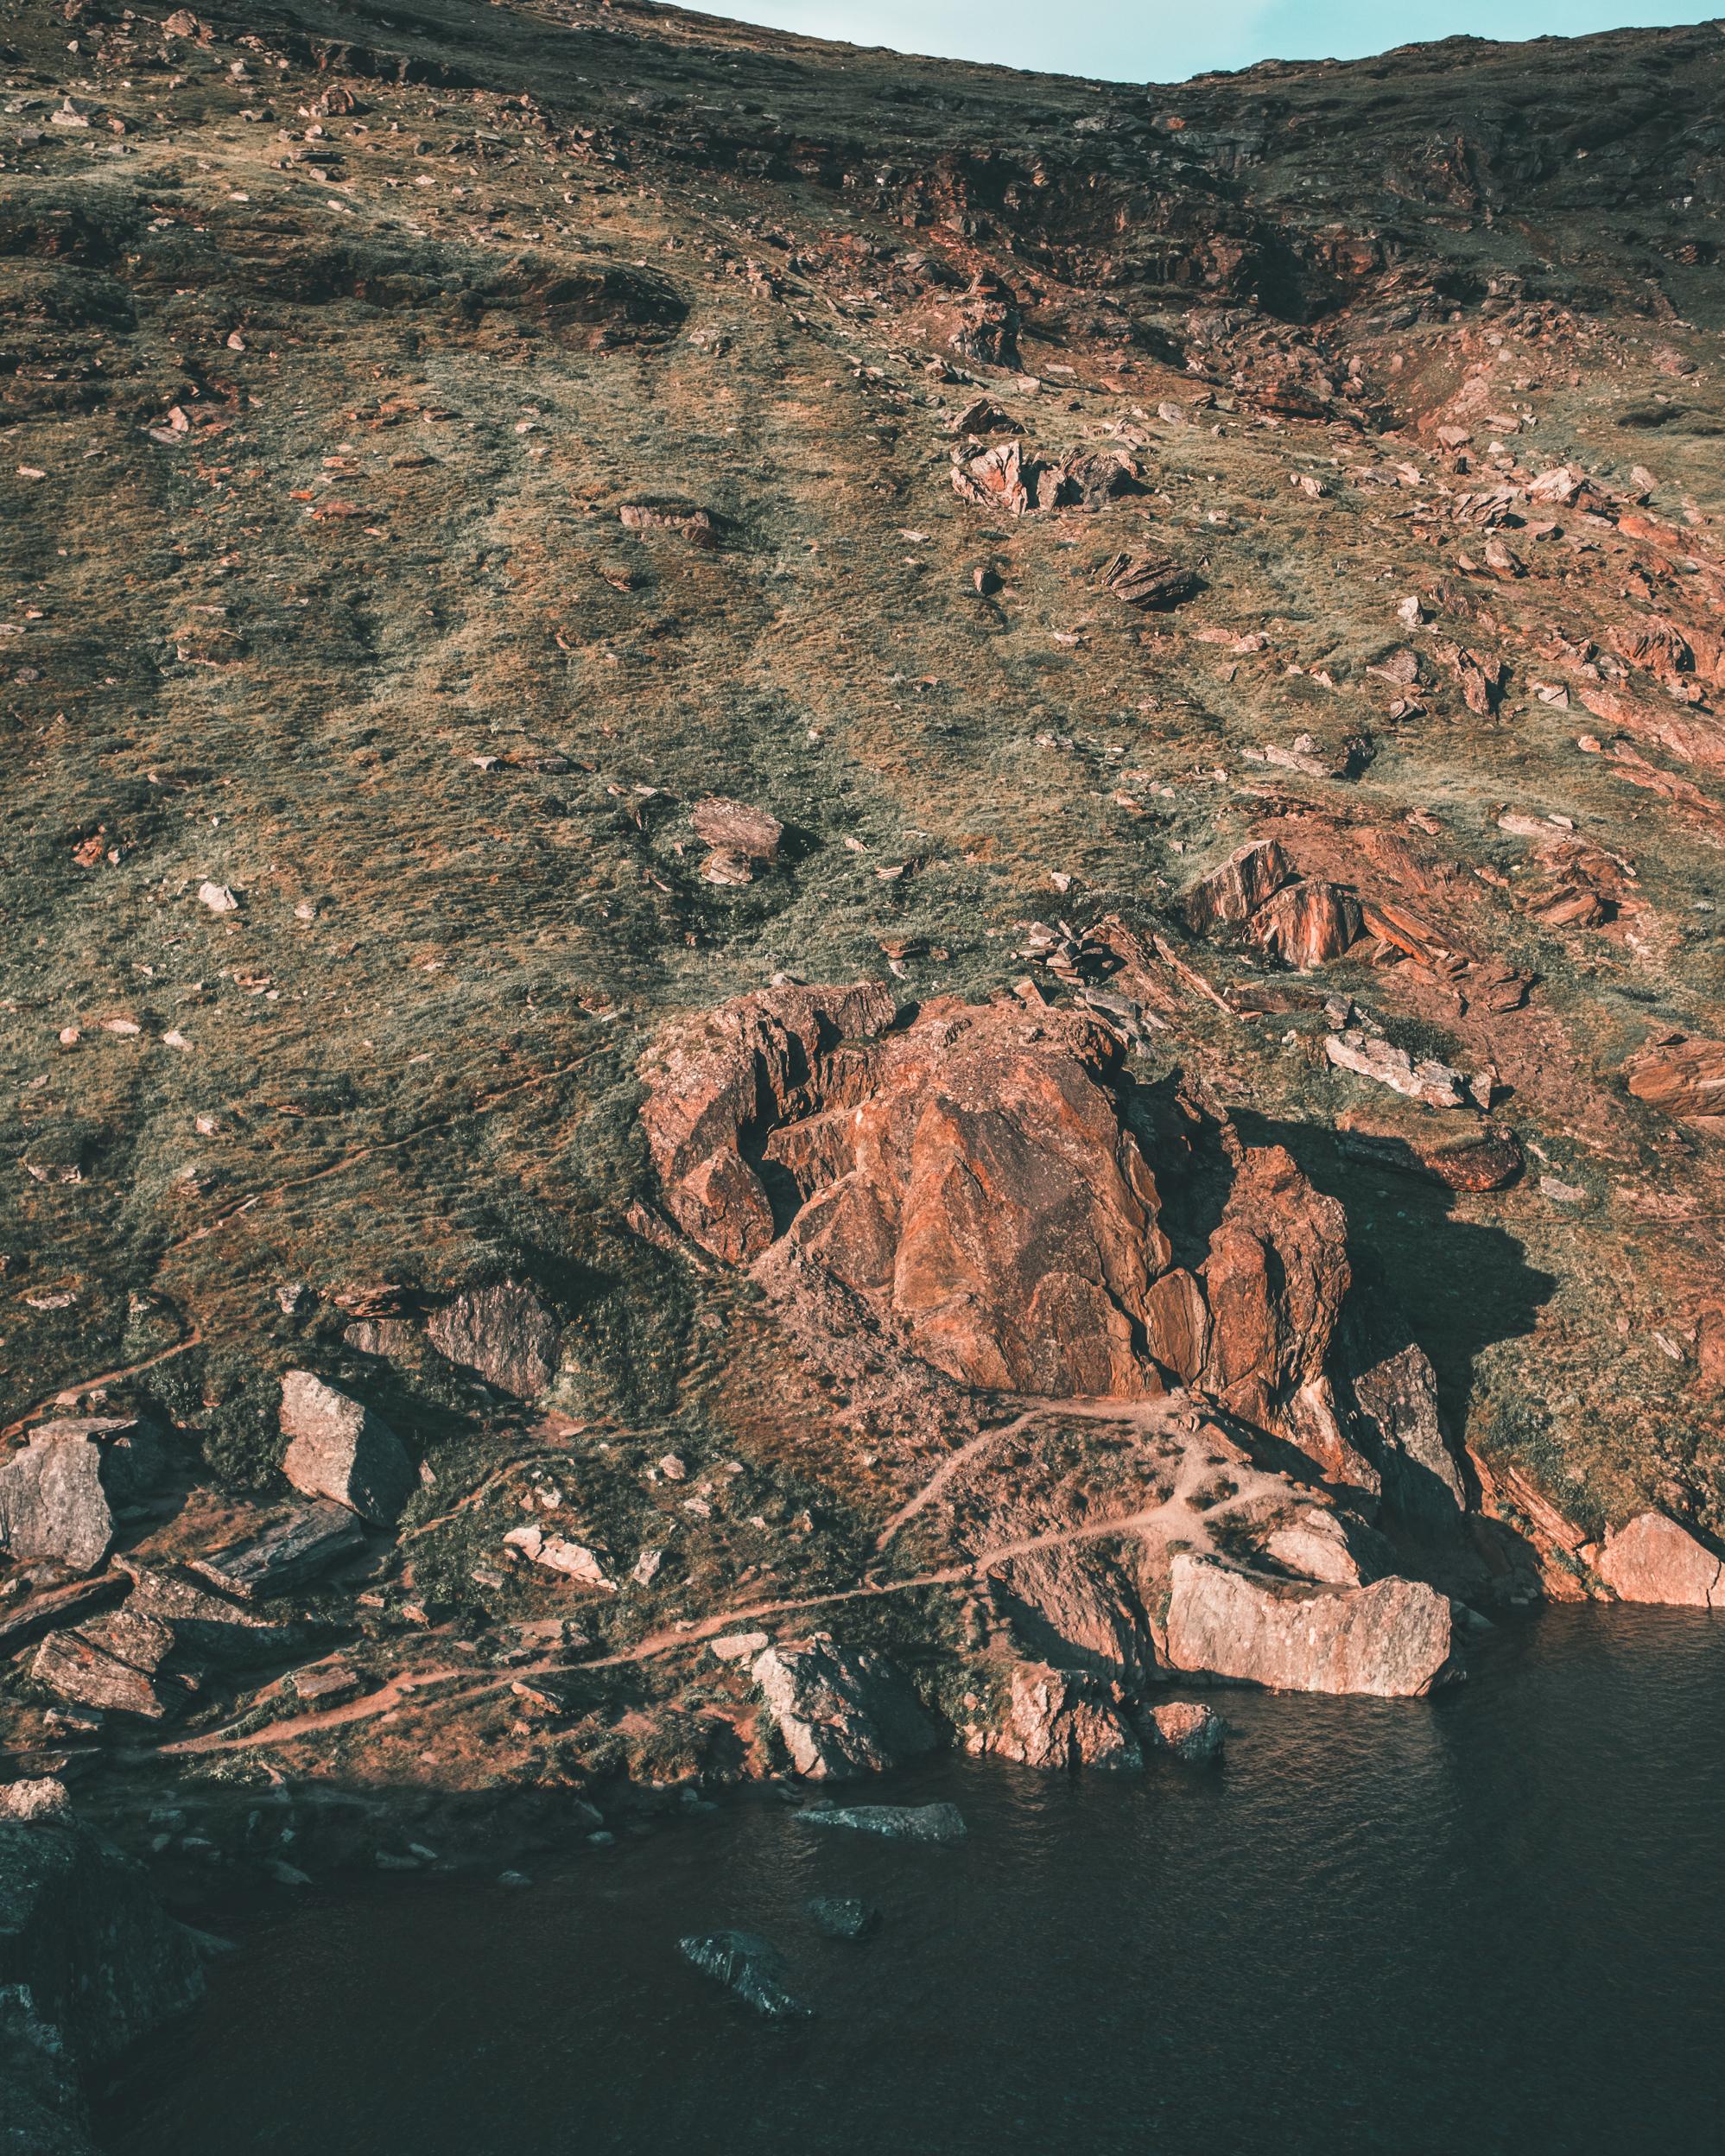 abisko+nationalpark+sverige+hike+vandring